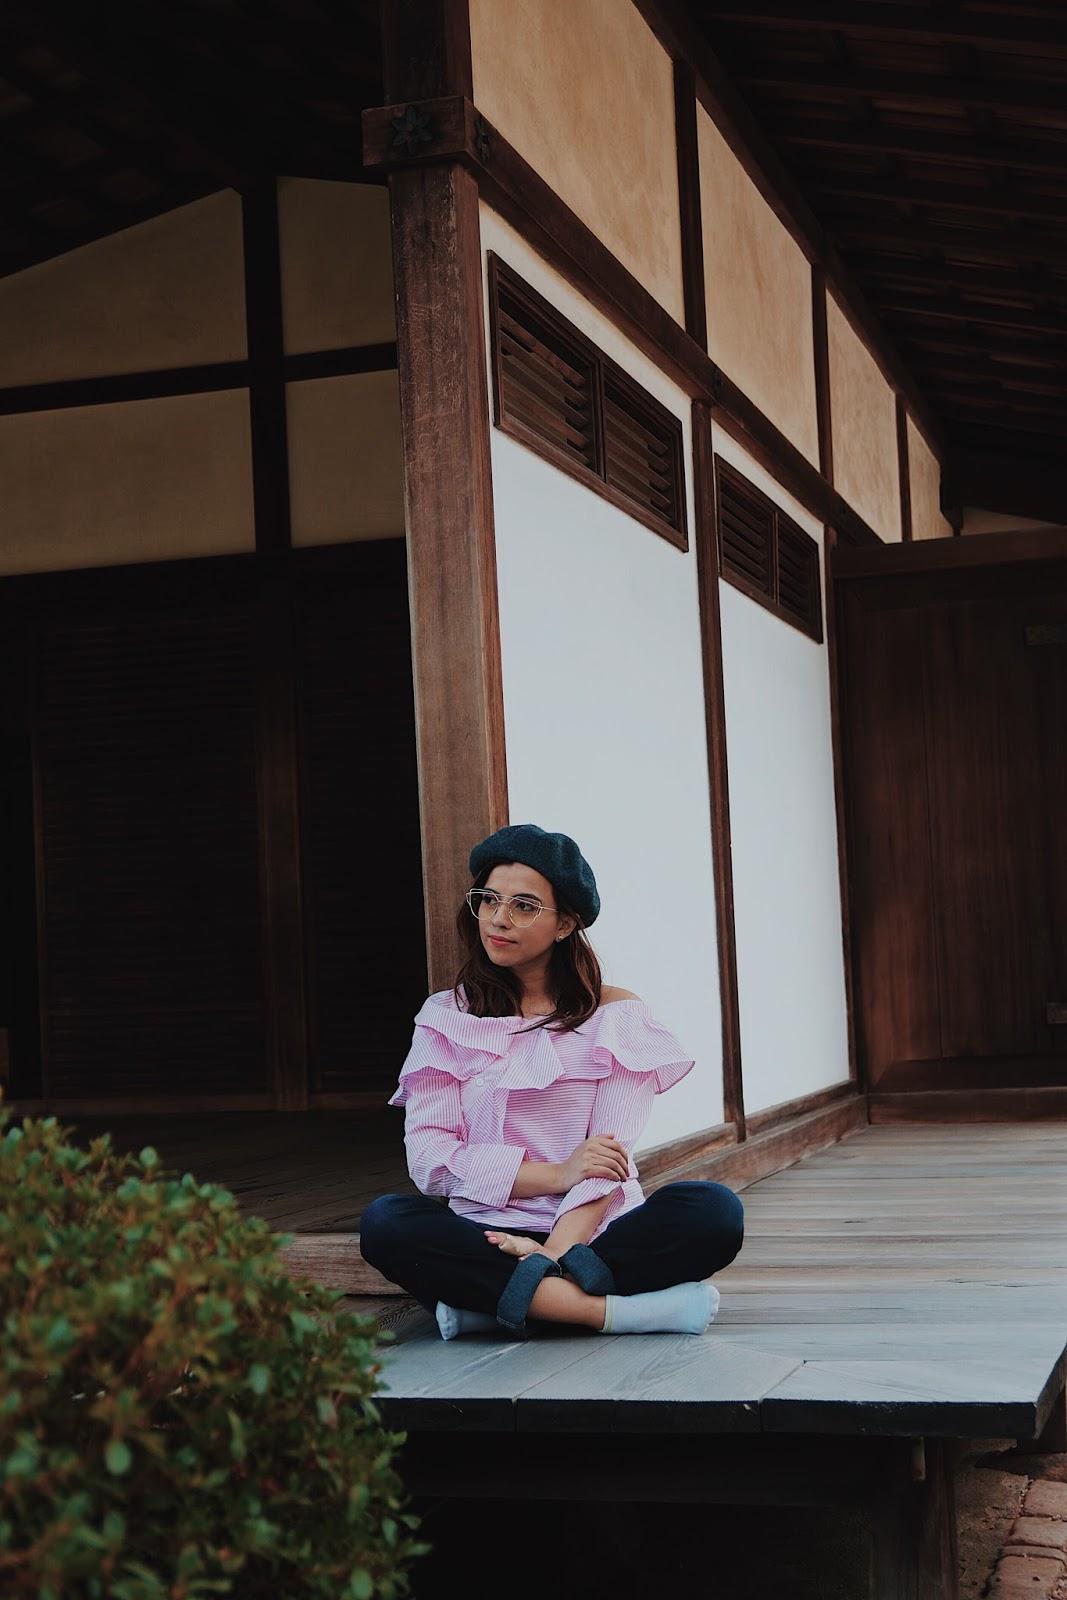 Subaru Cherry Blossom Festival by Mari Estilo